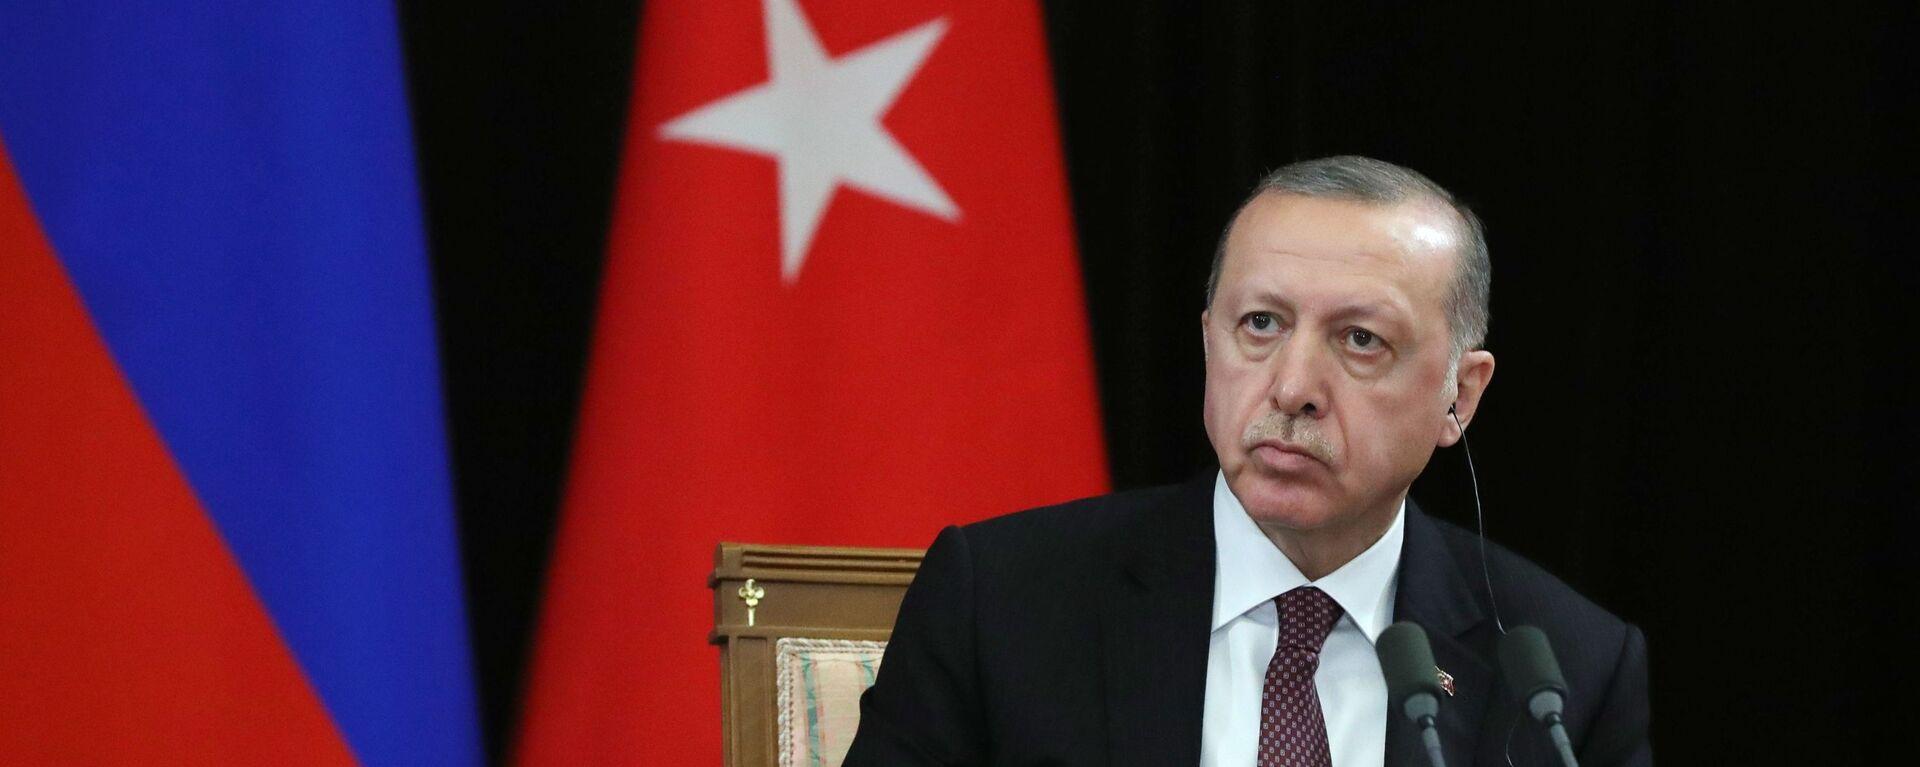 Il presidente turco Recep Tayyip Erdogan - Sputnik Italia, 1920, 29.08.2021